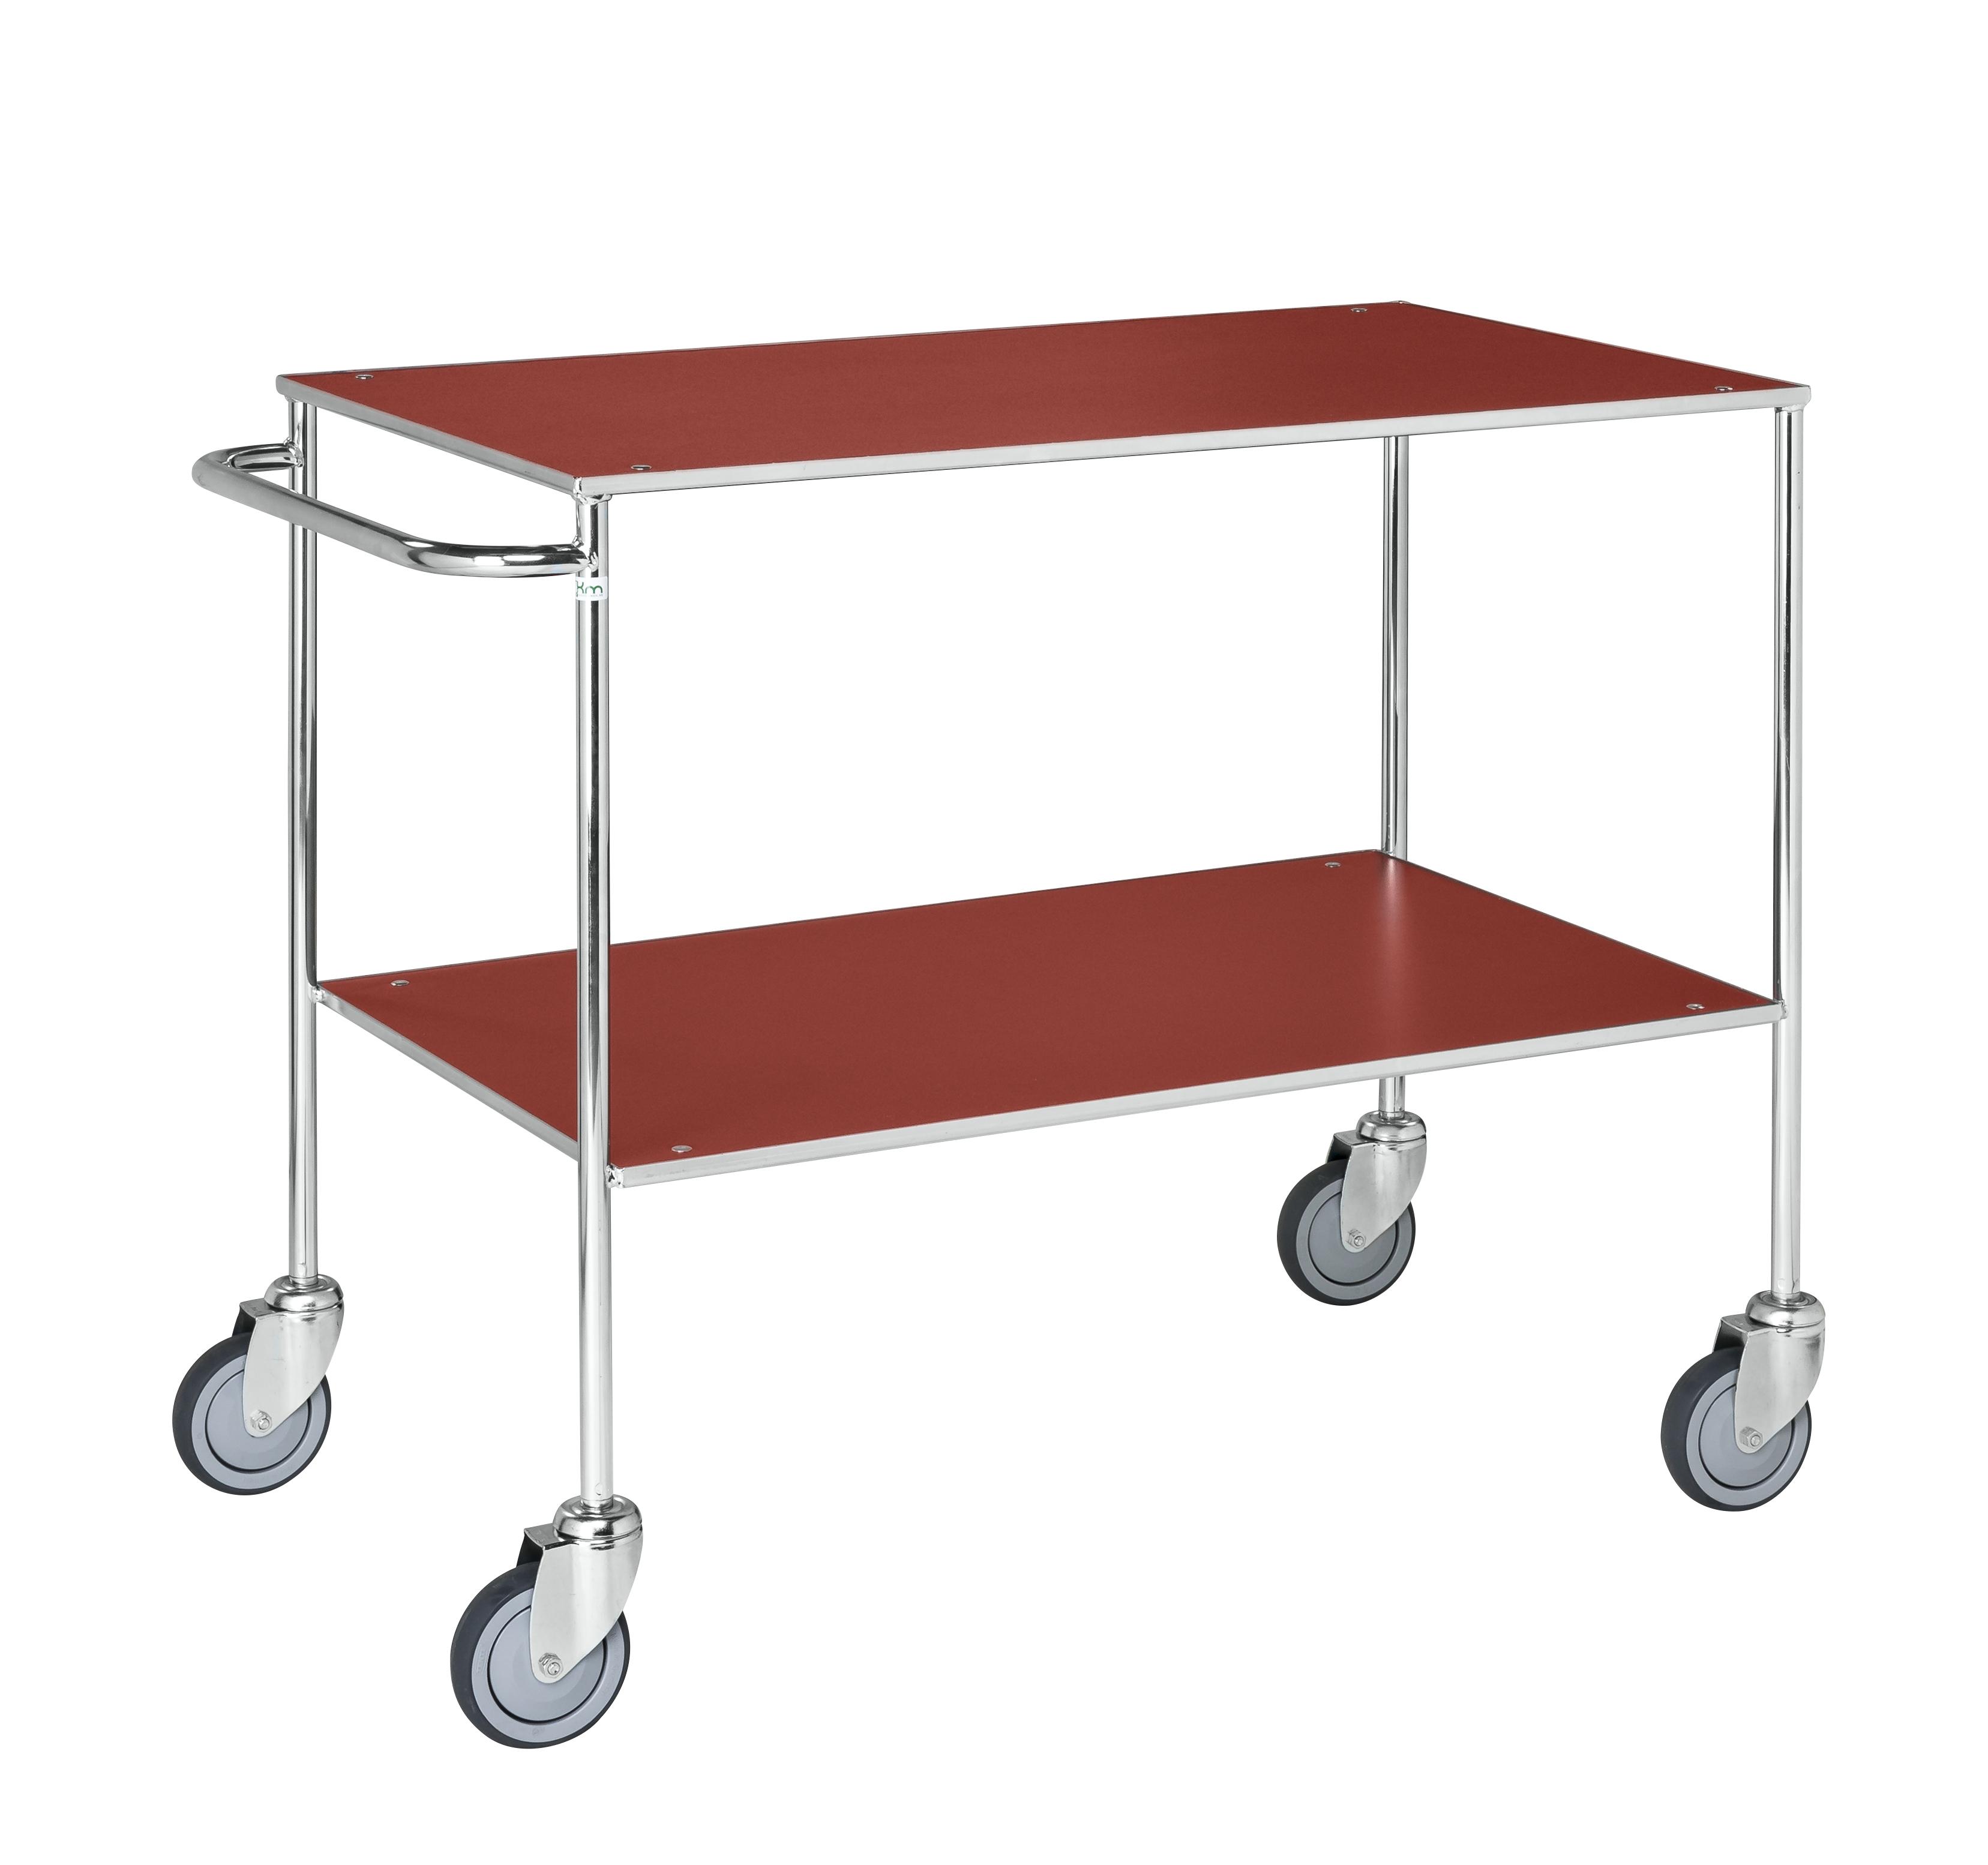 KM170-1   Table trolley, all-welded